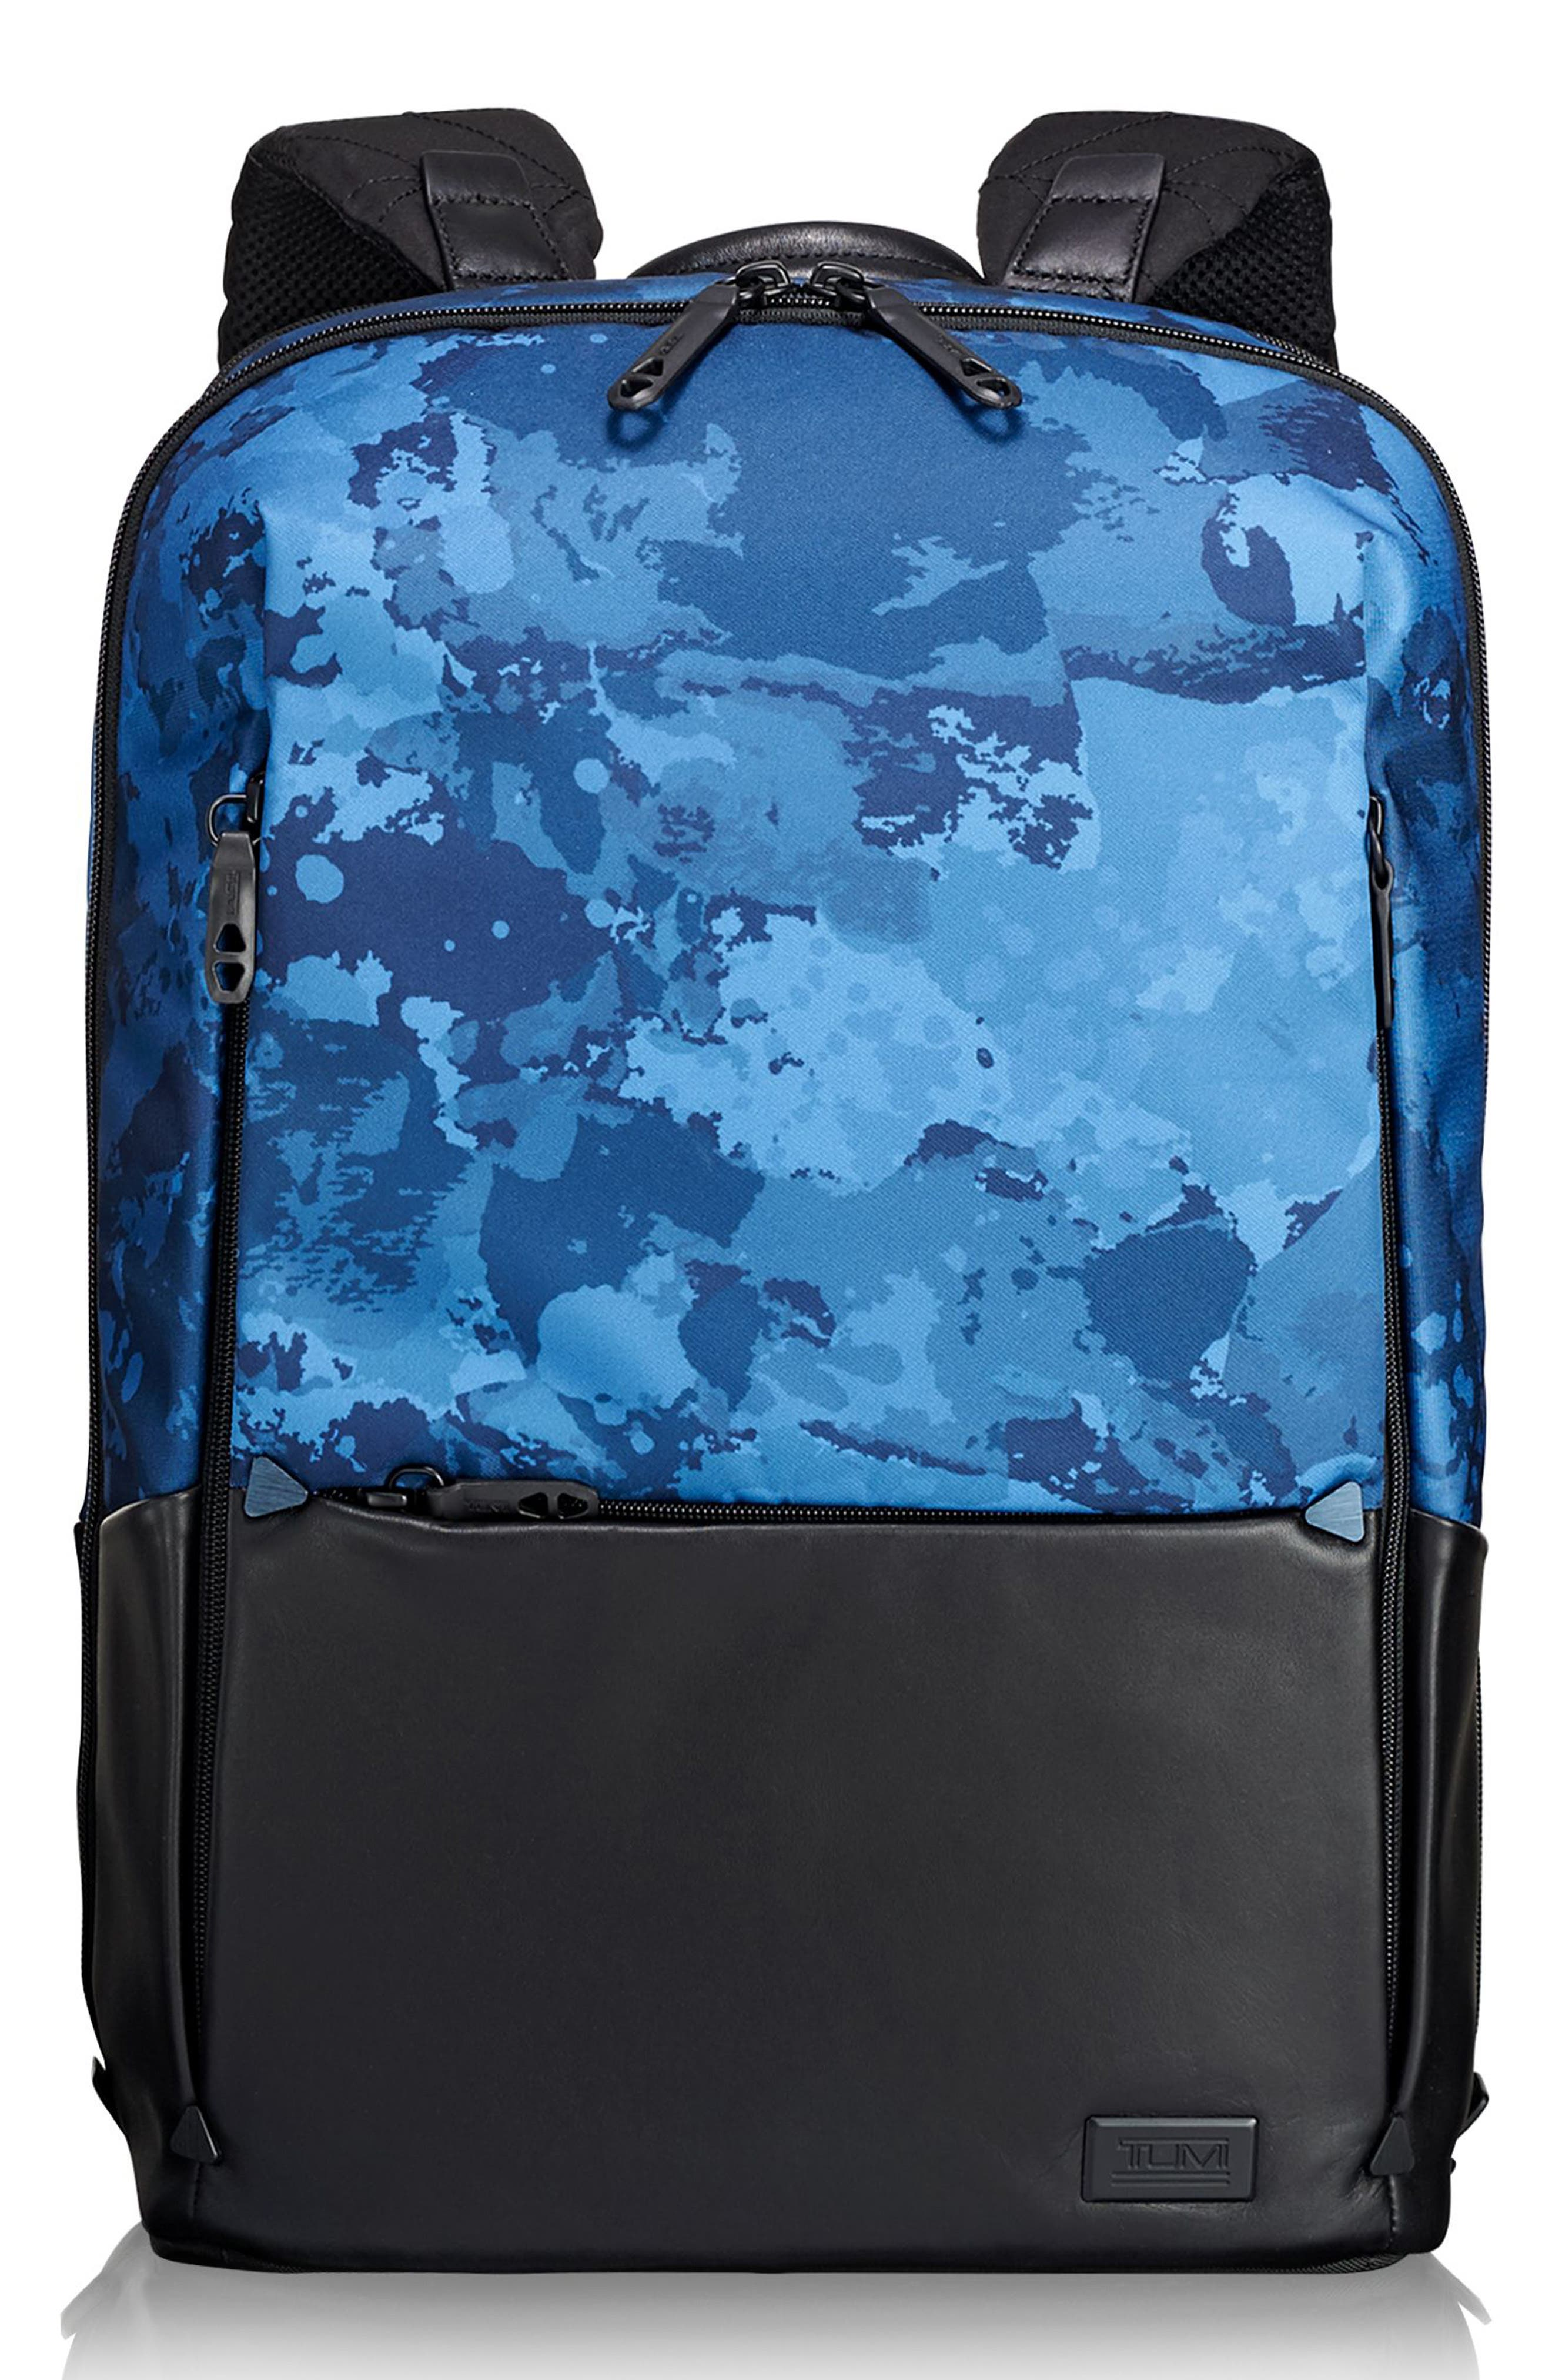 Tahoe - Butler Backpack,                             Main thumbnail 1, color,                             430